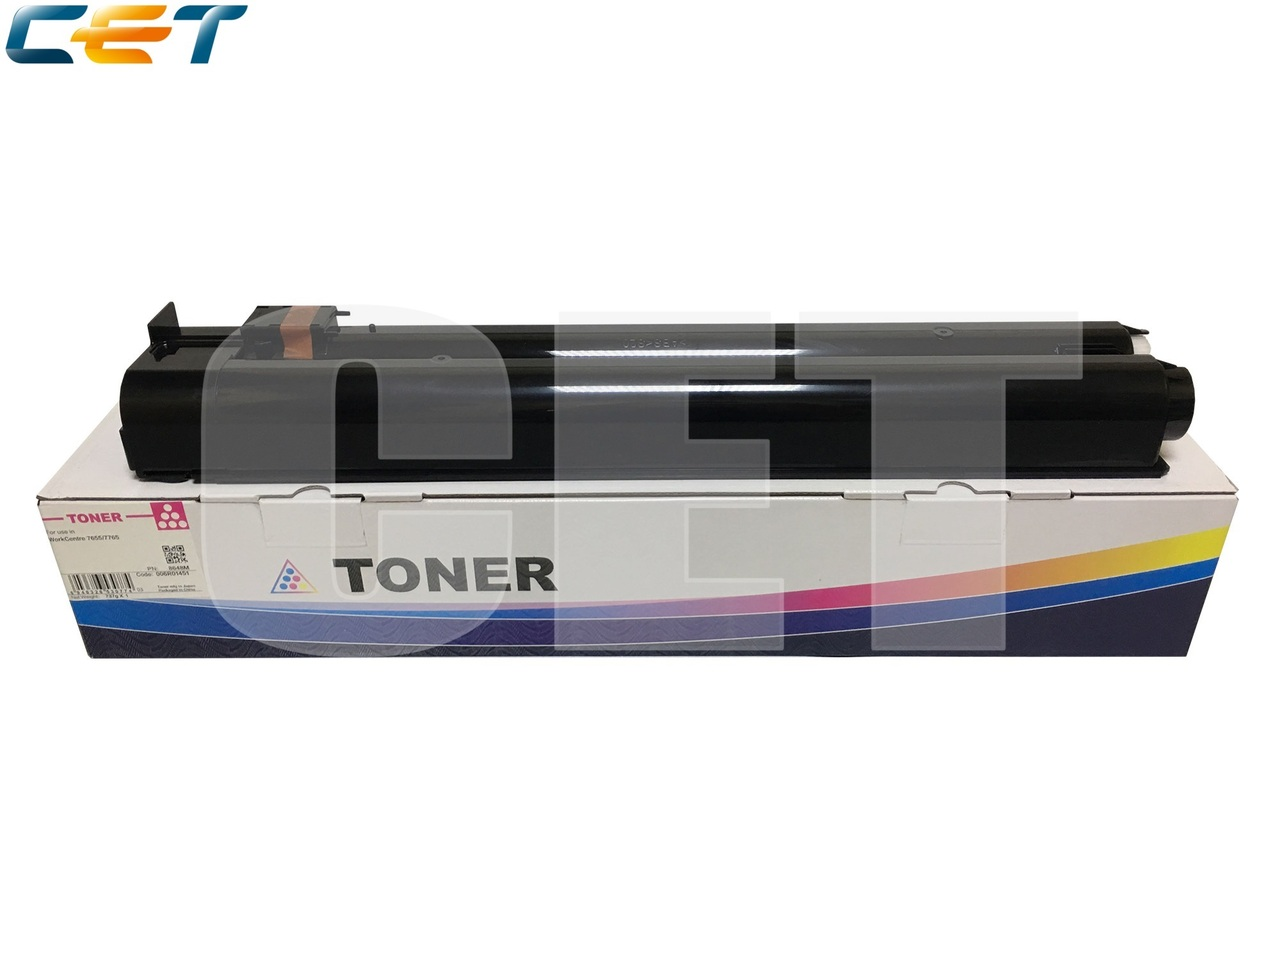 Тонер-картридж (CPT) 006R01451 для XEROX WorkCentre7655/7765 (CET) Magenta, 737г, 34000 стр., CET8648M